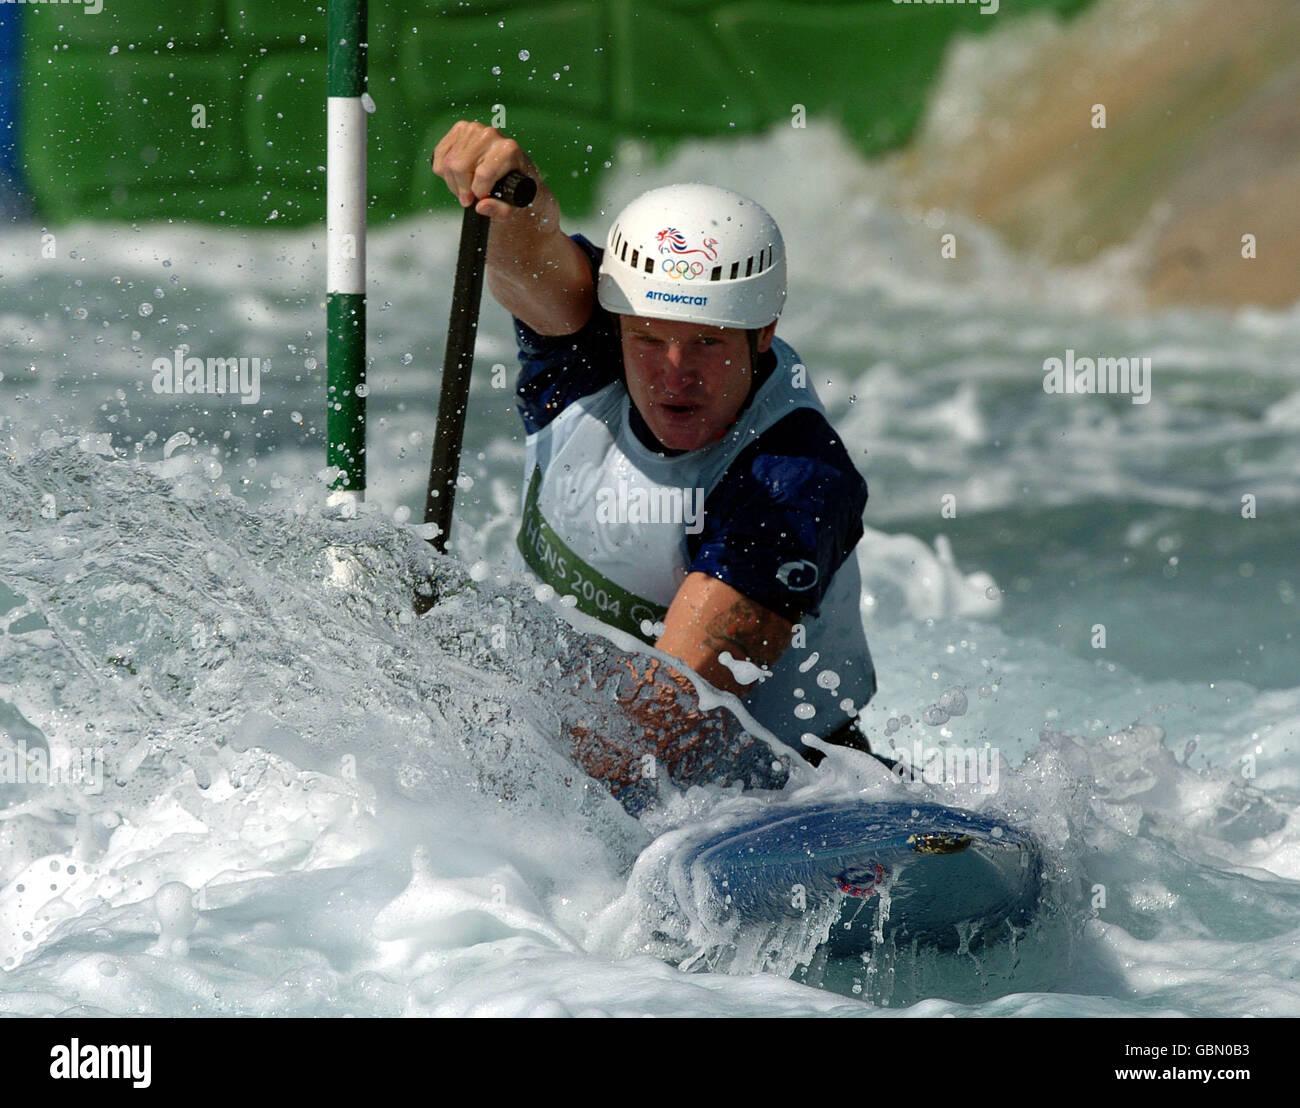 Canoe Slalom - Athens Olympic Games 2004 - Men's C1 Stock